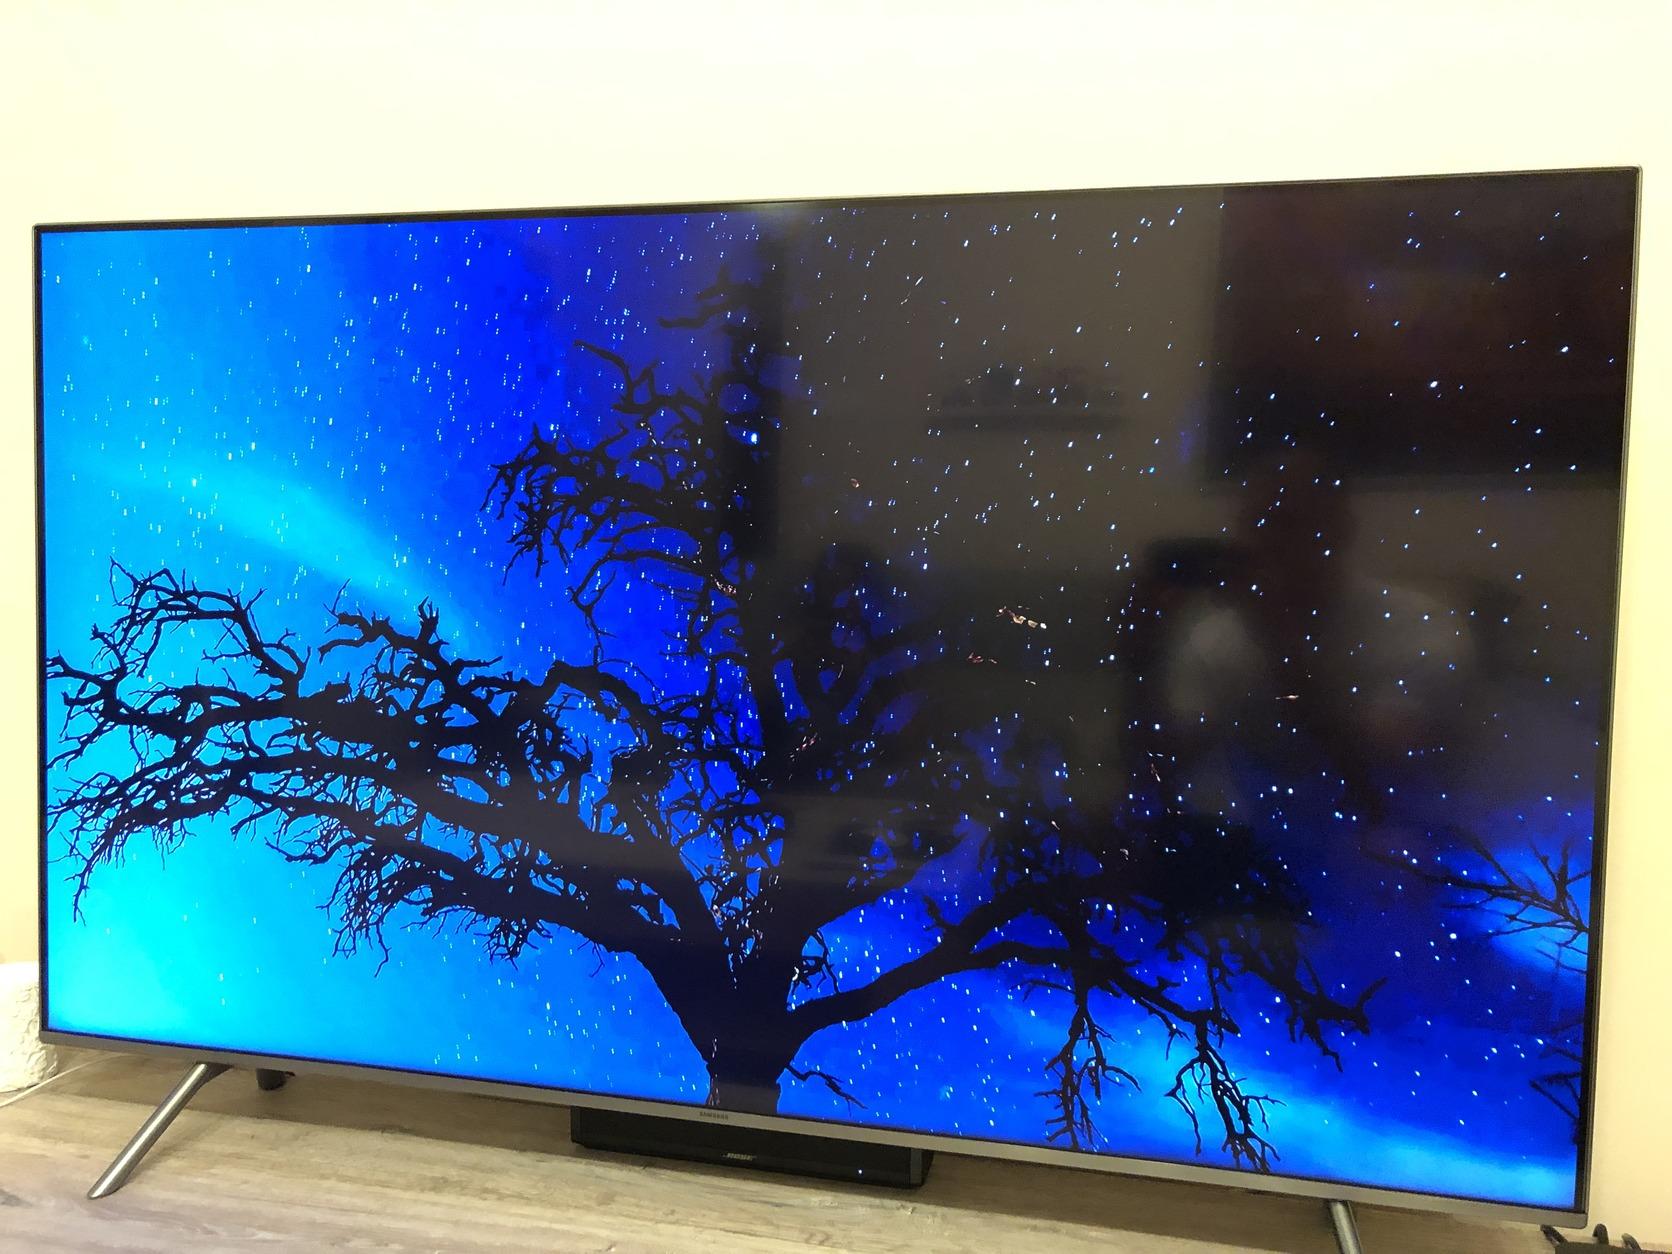 Danis Fermi } | The Perfect 4k TV